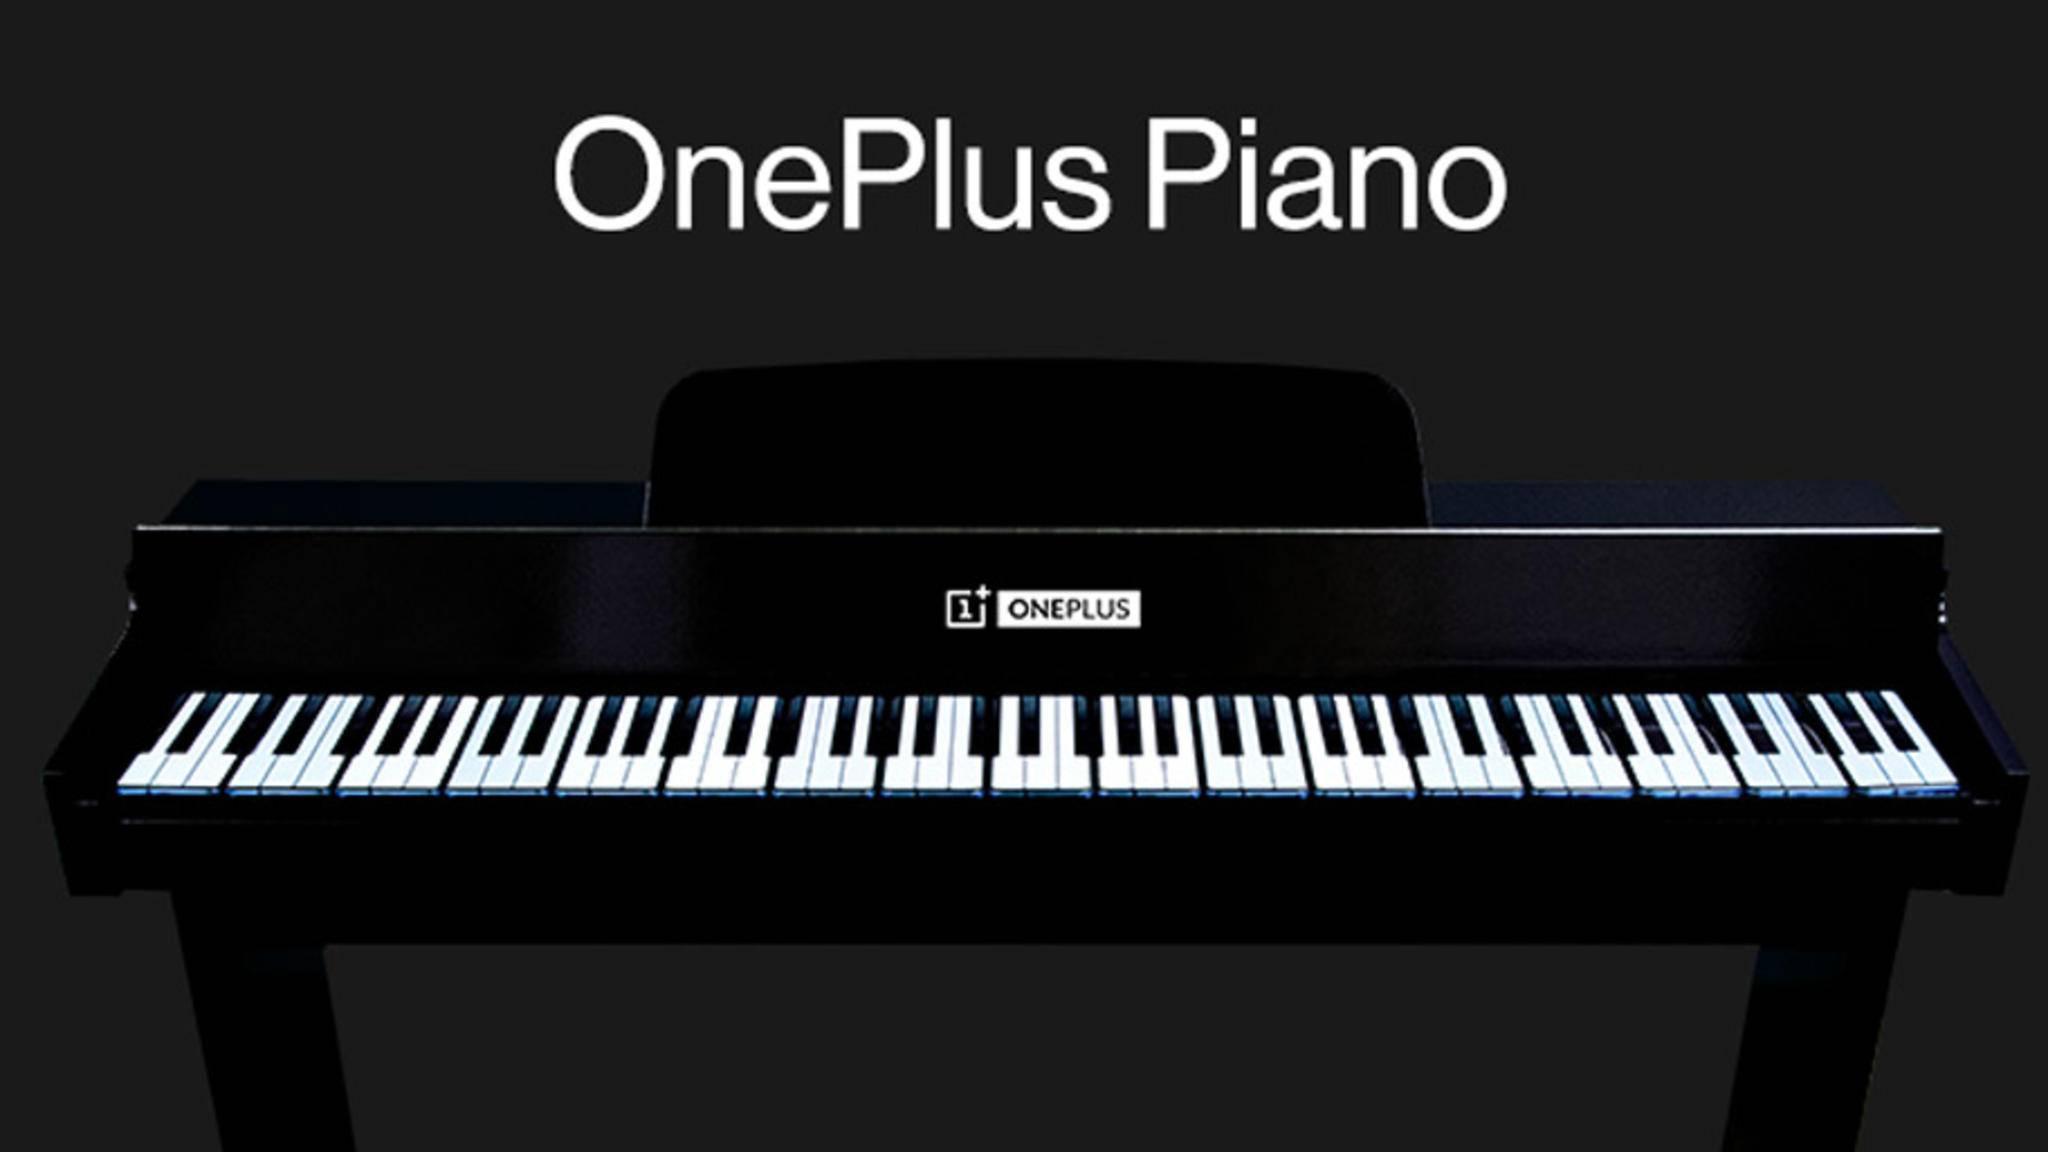 oneplus-piano